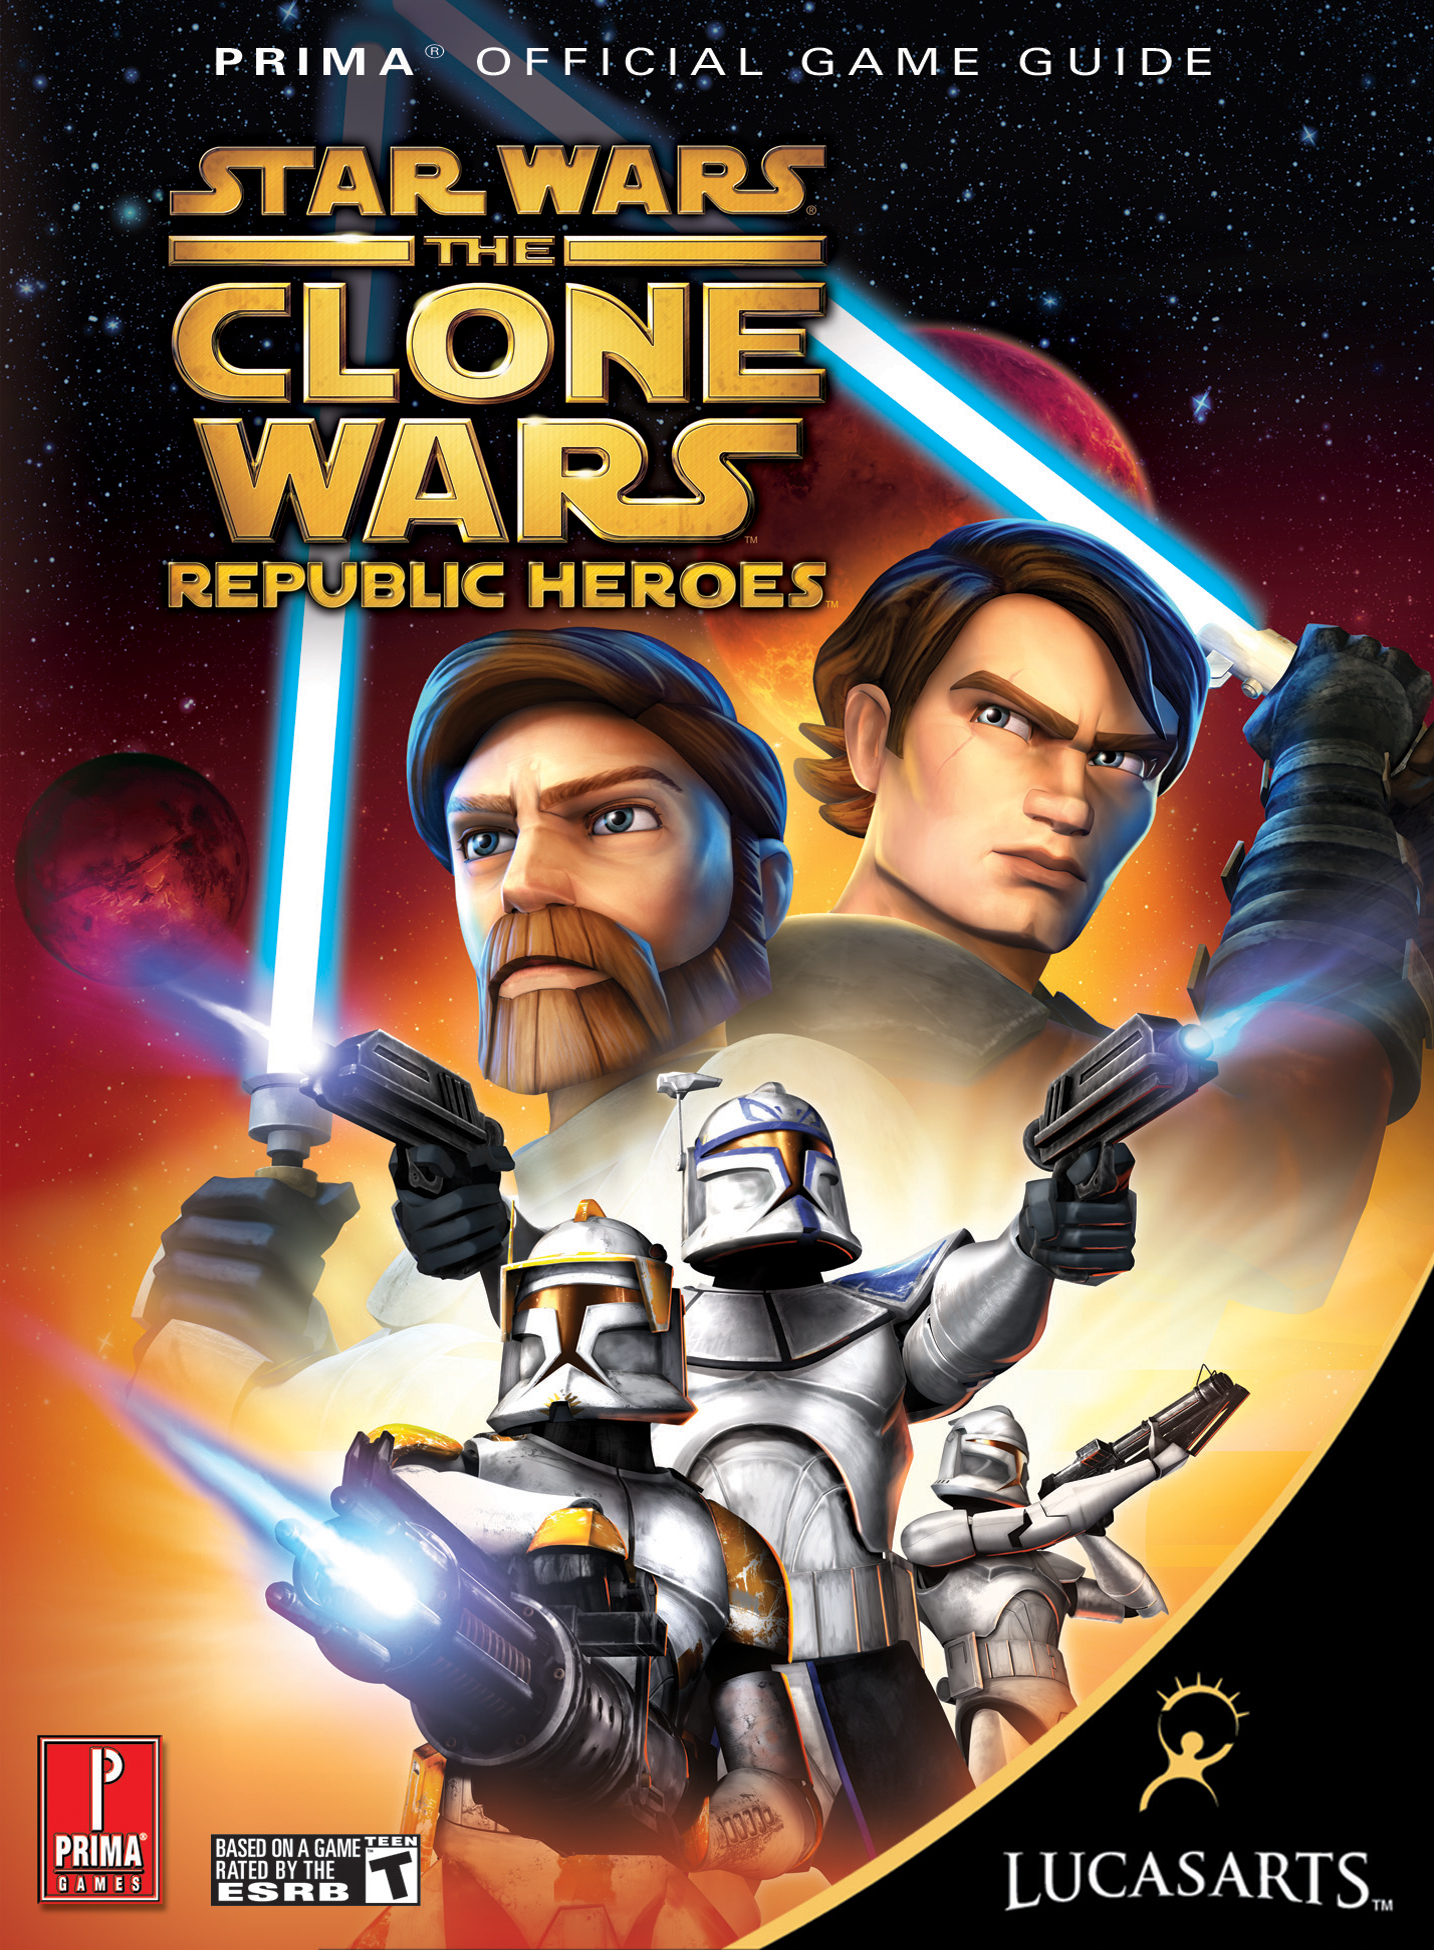 http://img3.wikia.nocookie.net/__cb20090810211806/starwars/images/f/f2/Republic_Heroes_Prima_Guide.jpg